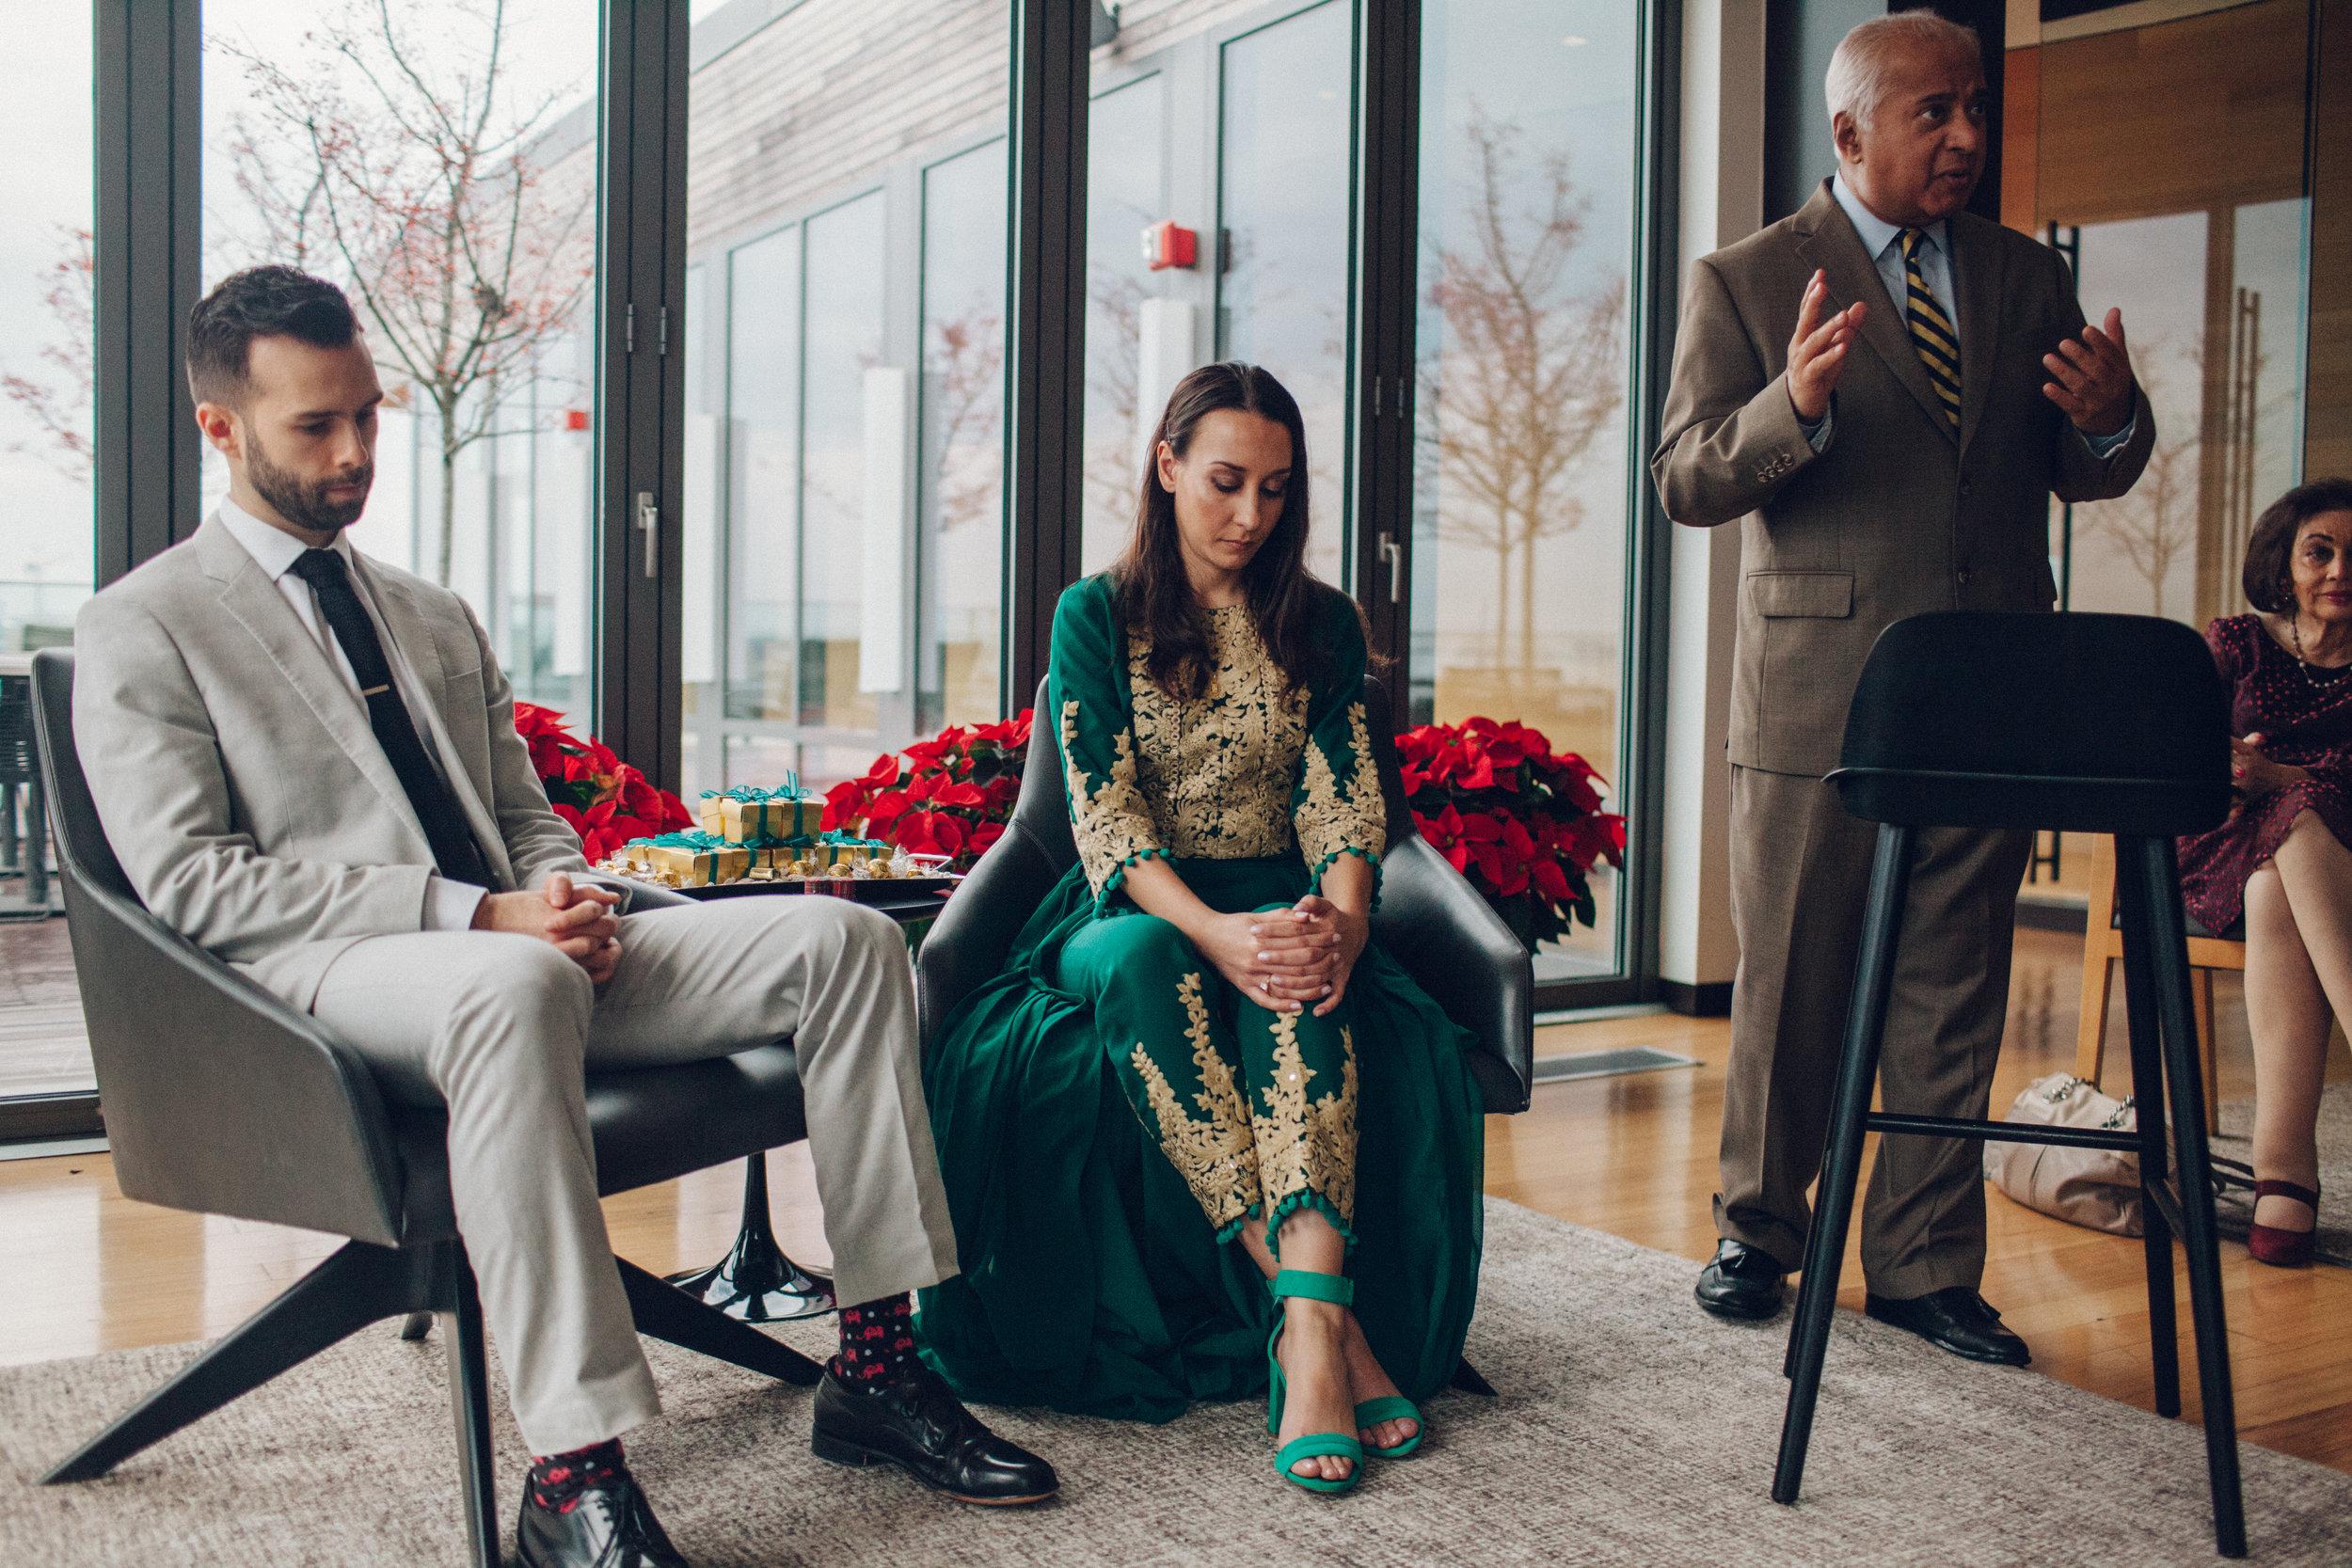 Nikah in the Afghan wedding ceremony